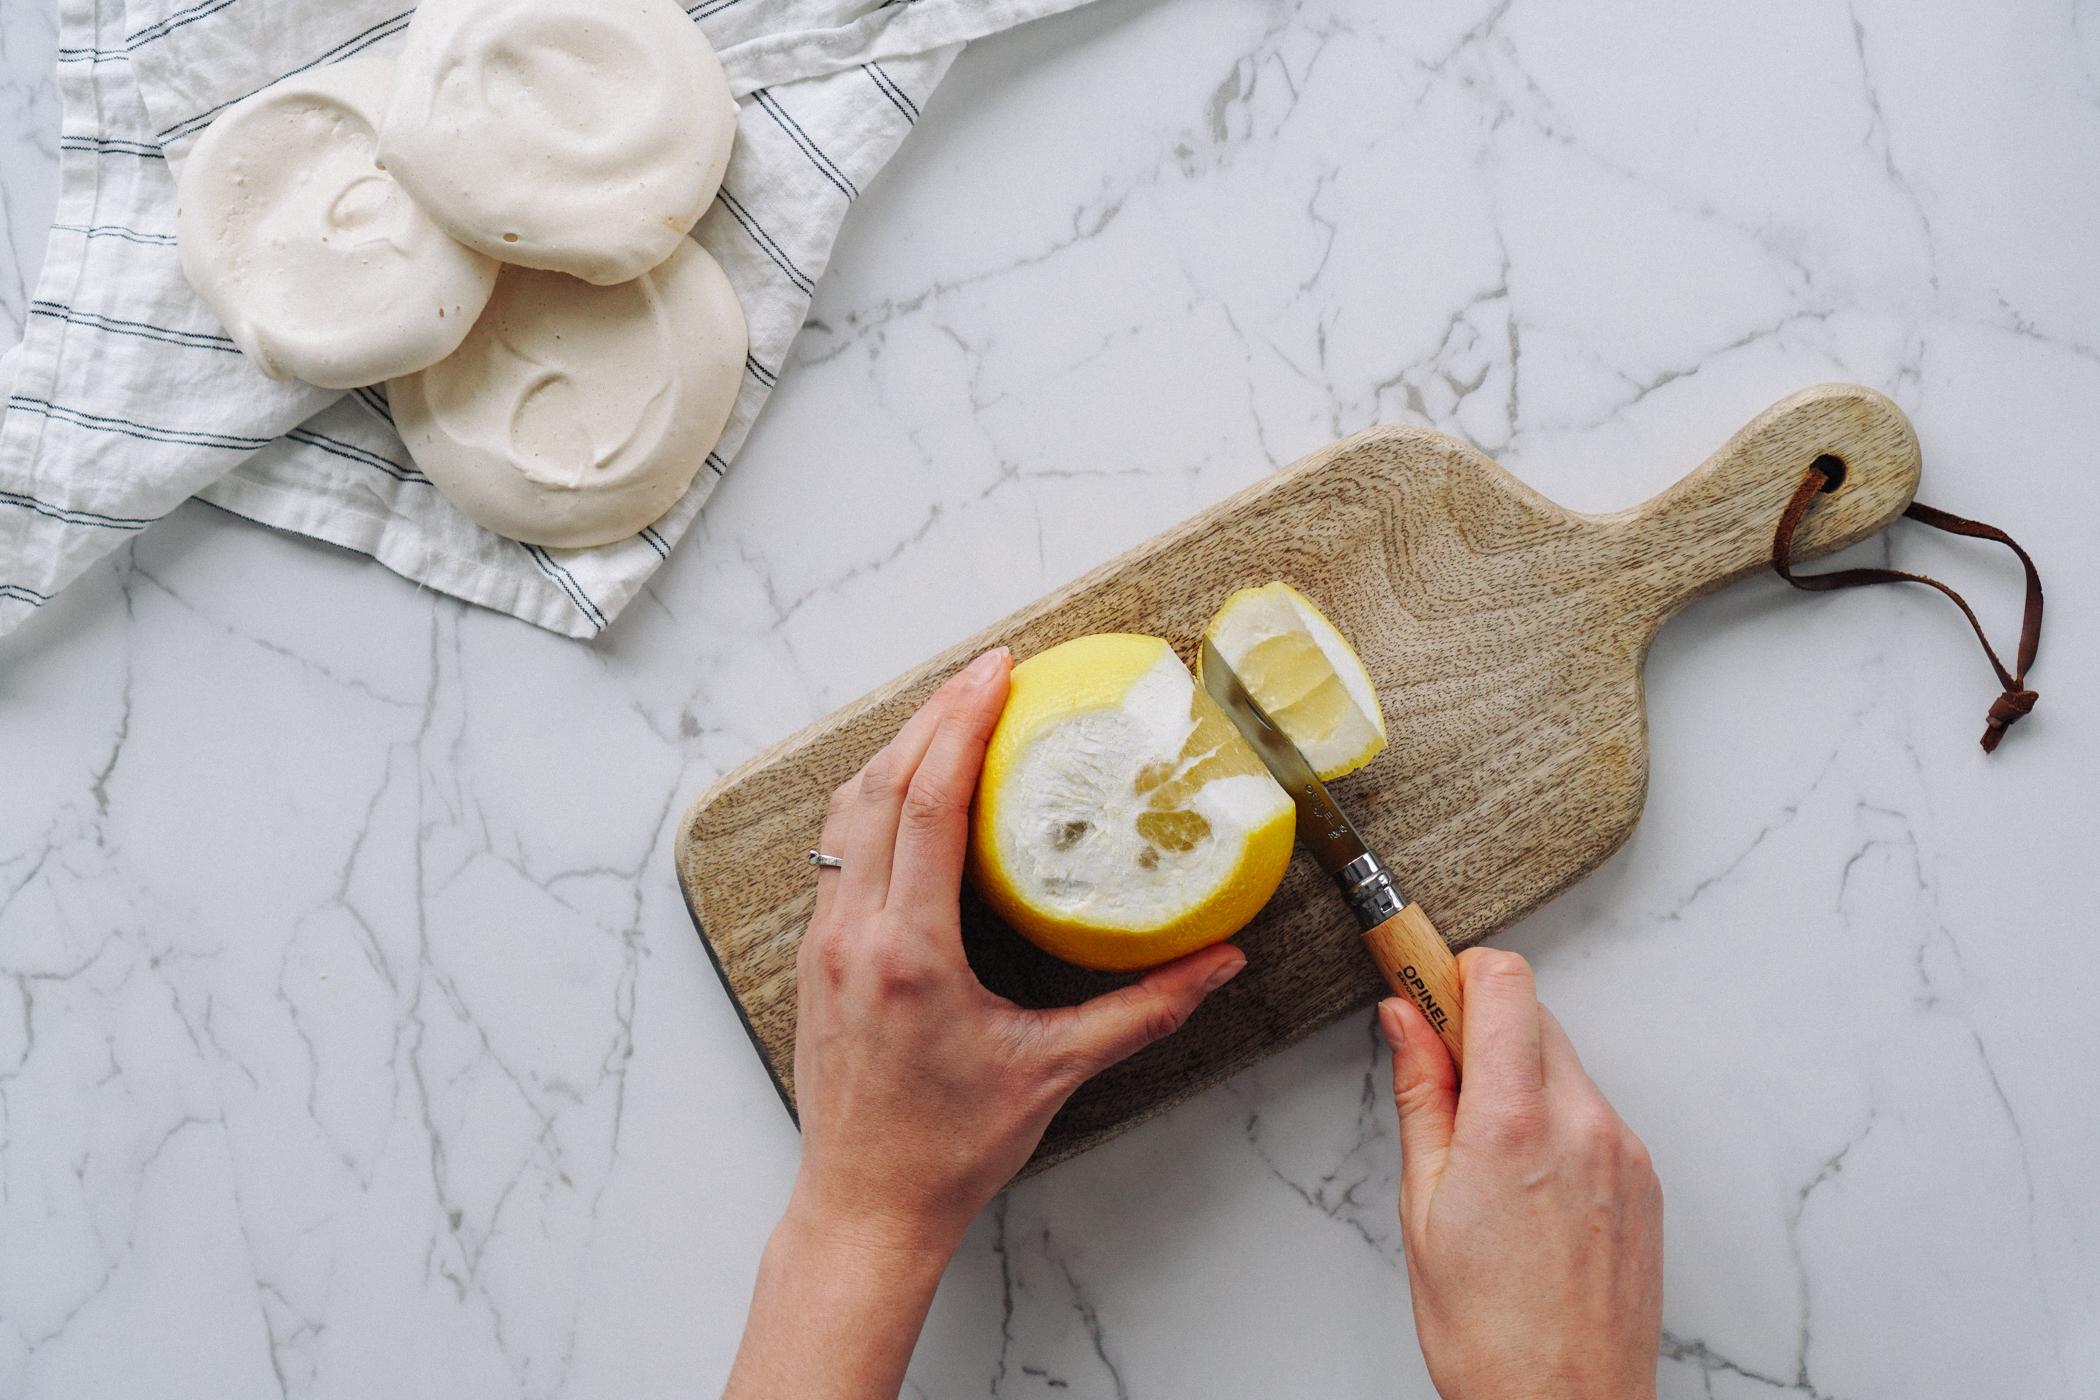 vegan_citrus_pavlova_with_coconut_cream_and_thyme-41.jpg